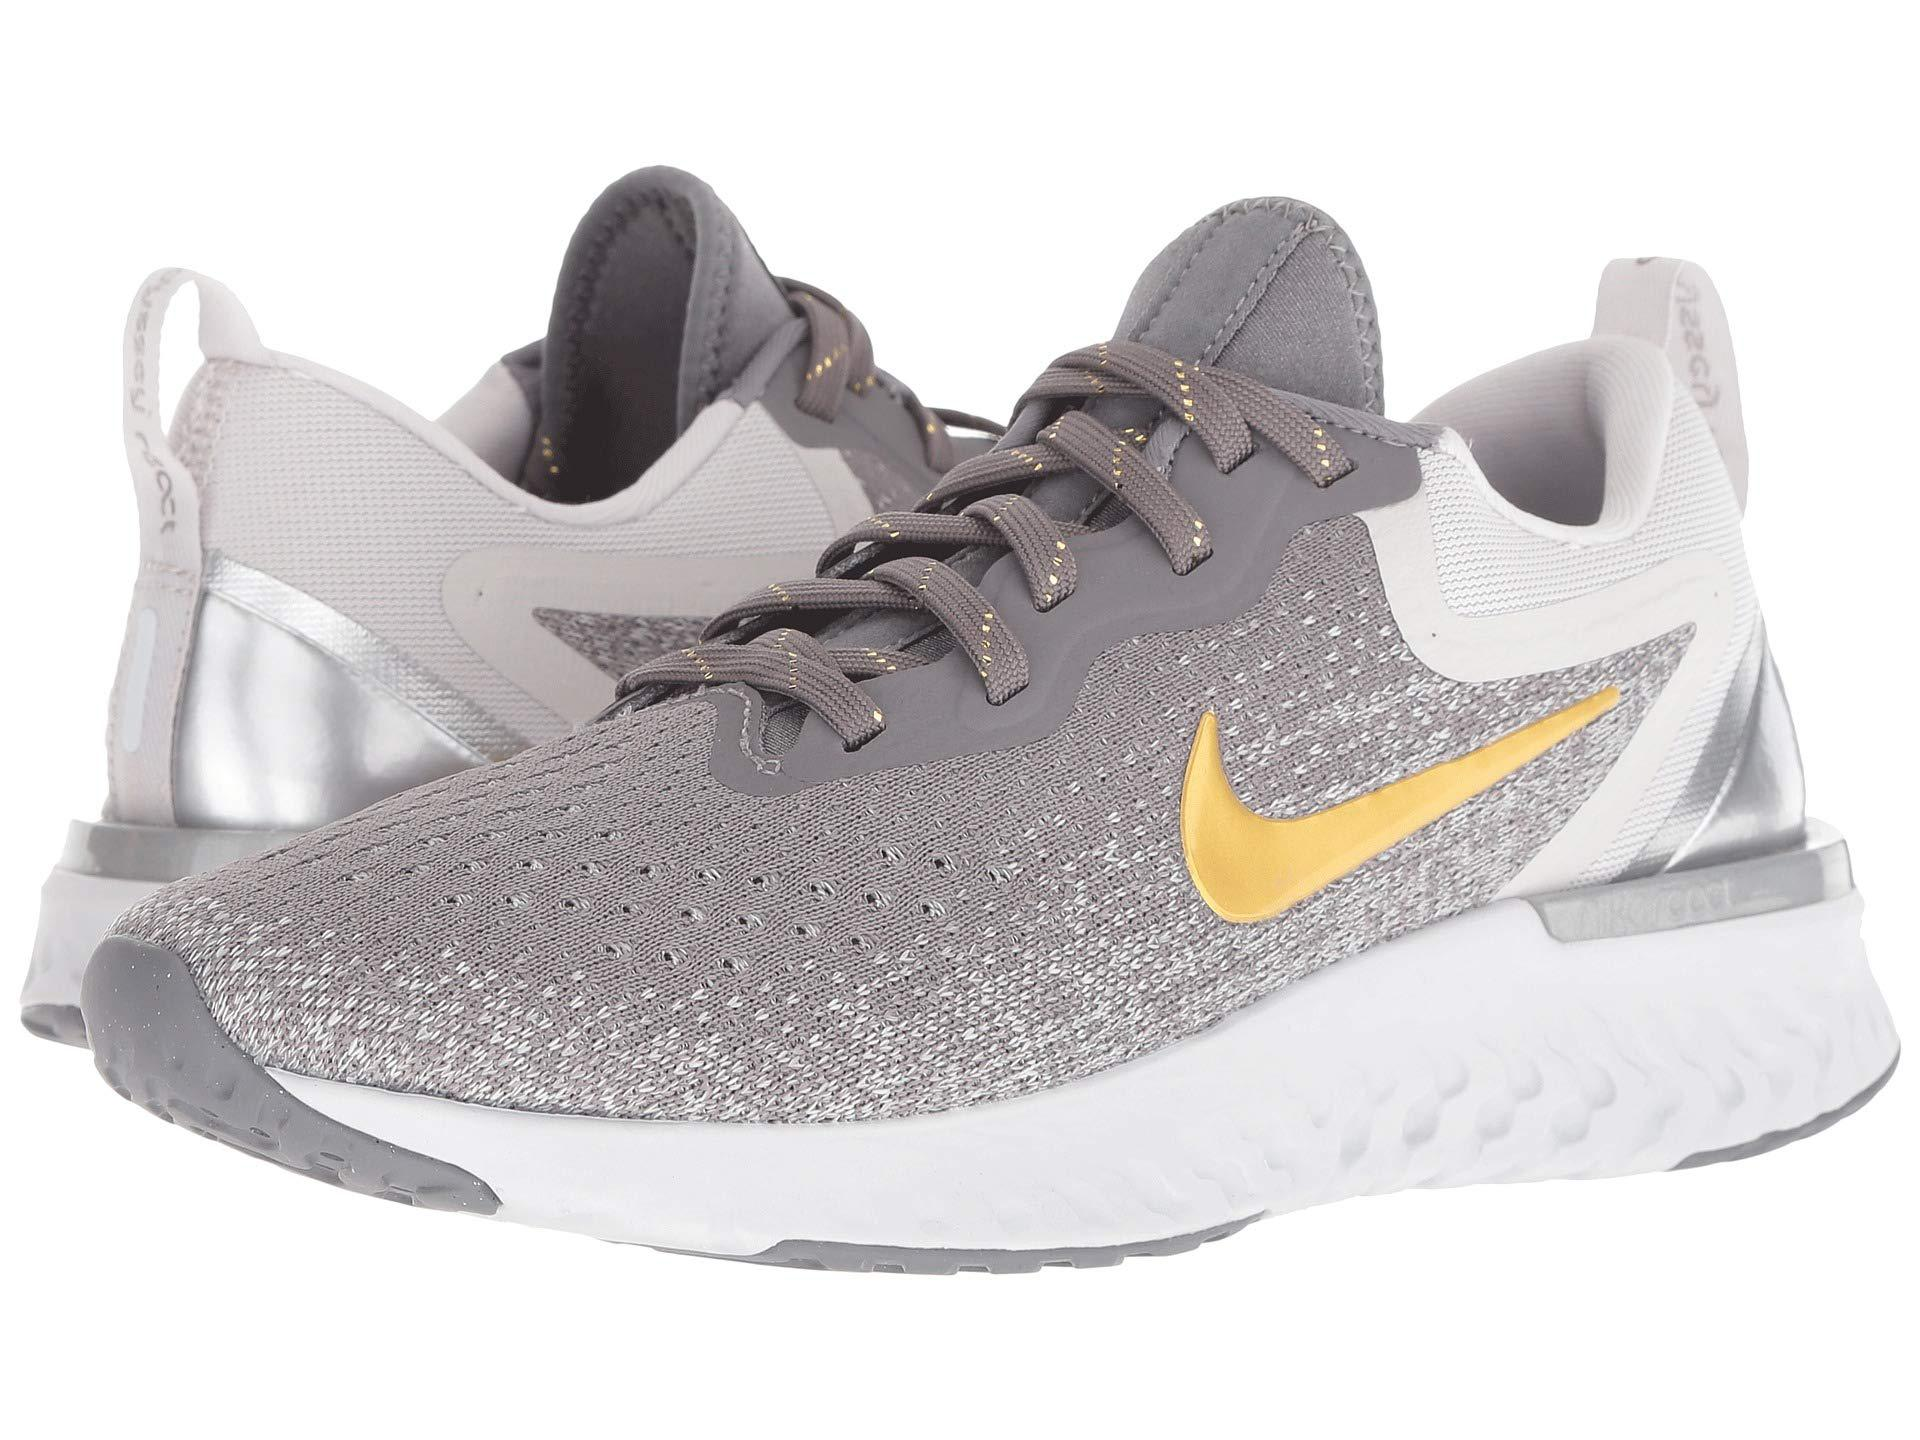 newest collection d44b9 75d7c Nike Odyssey React Premium (gunsmoke metallic Gold vast Grey ...